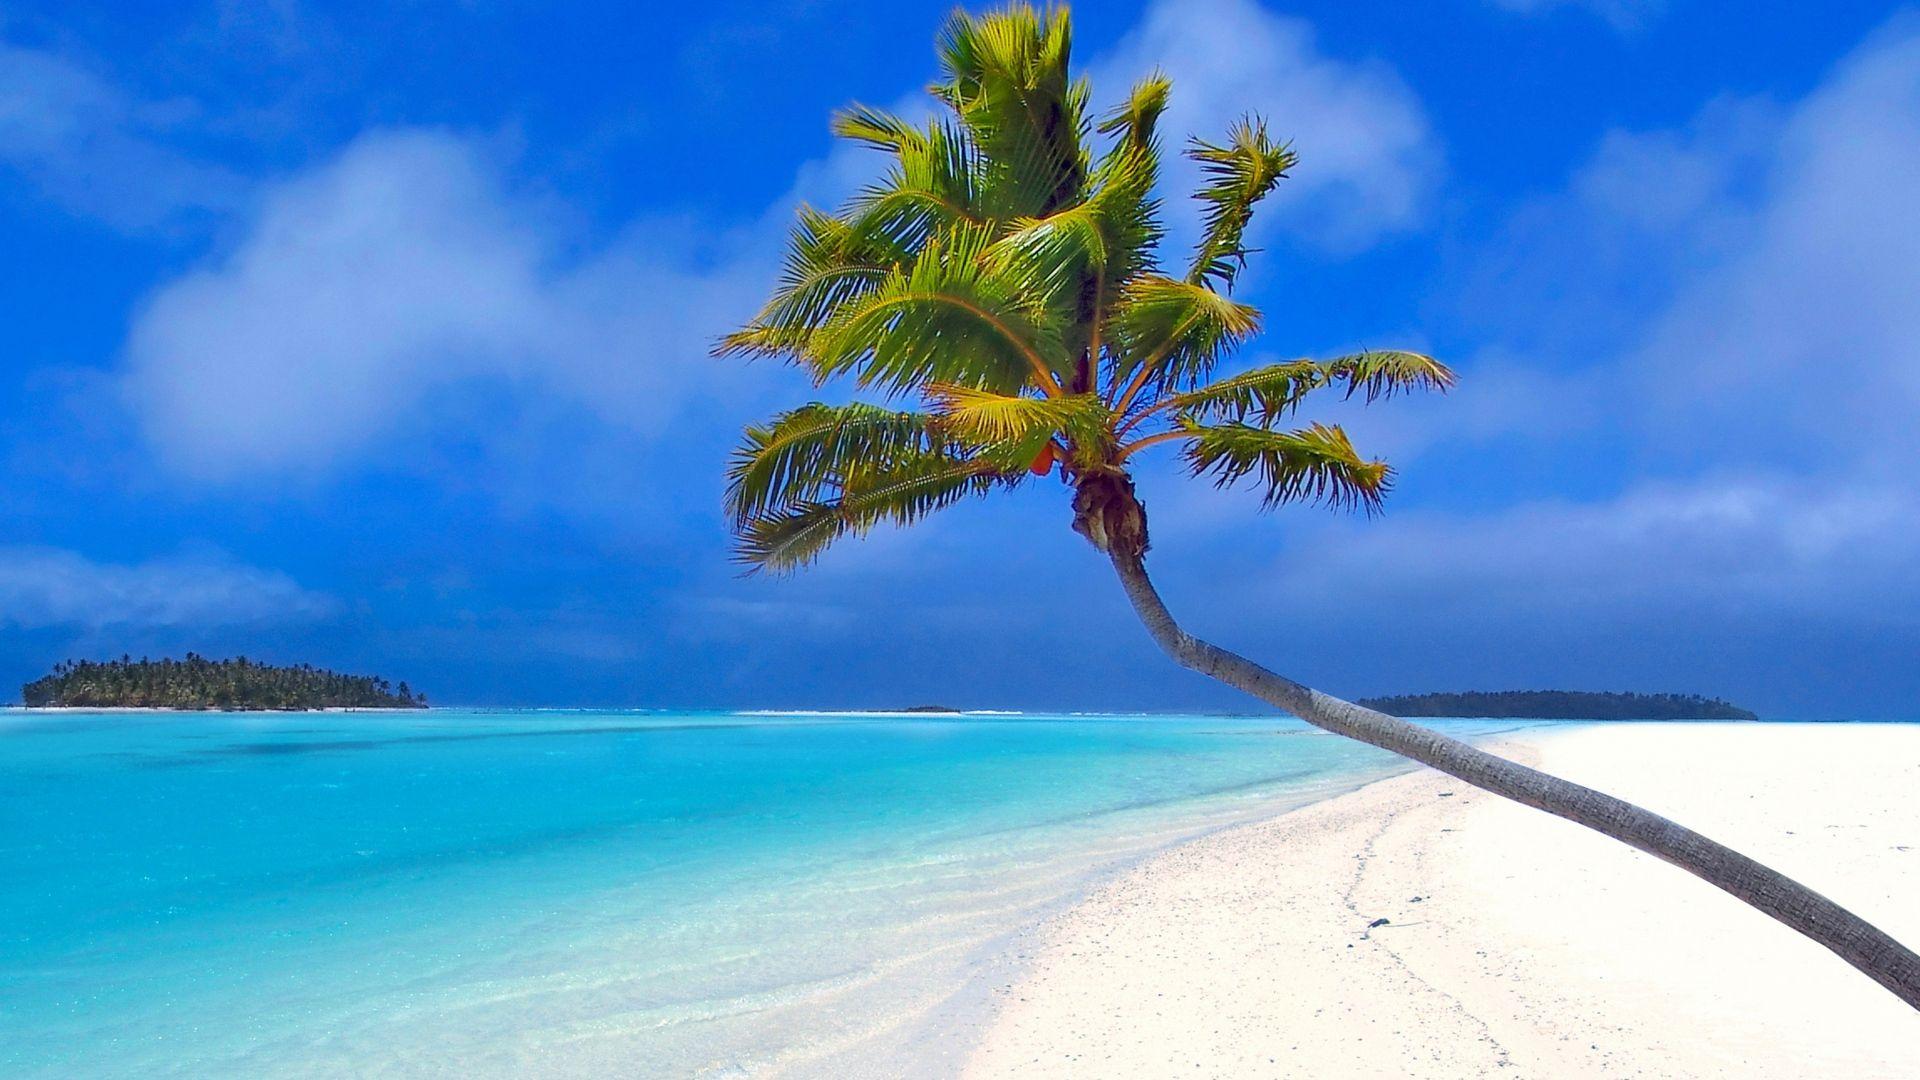 Full Hd P Maldives Wallpapers Hd Desktop Backgrounds Island Wallpaper Maldives Island Beach Landscape